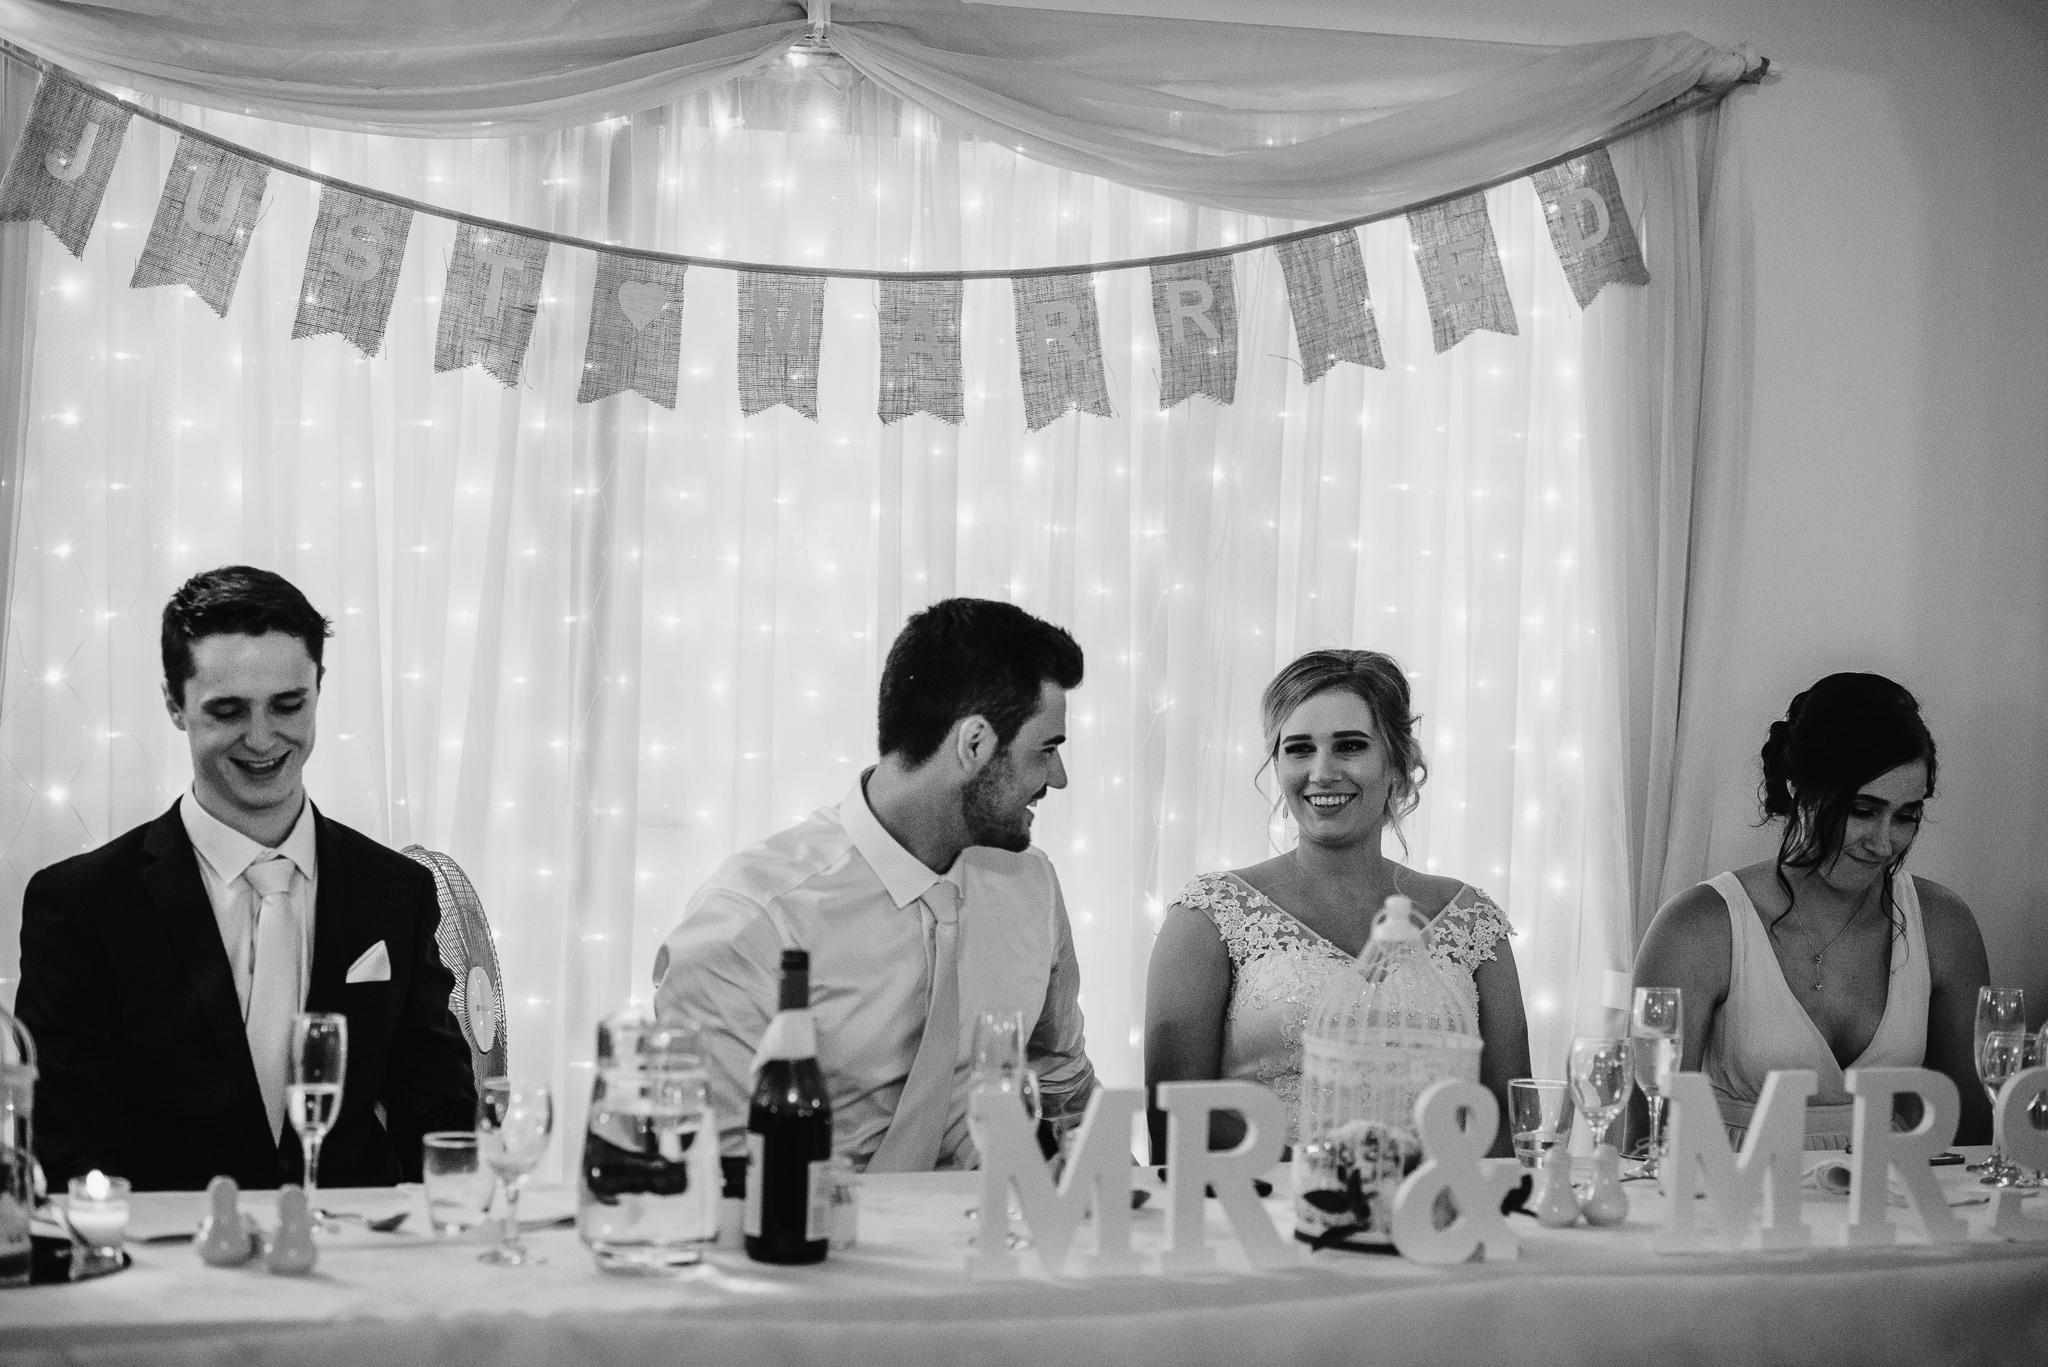 Tauranga-Coromandel-Elegant-Wedding-Photographer-Charlemagne-Lodge-110.jpg